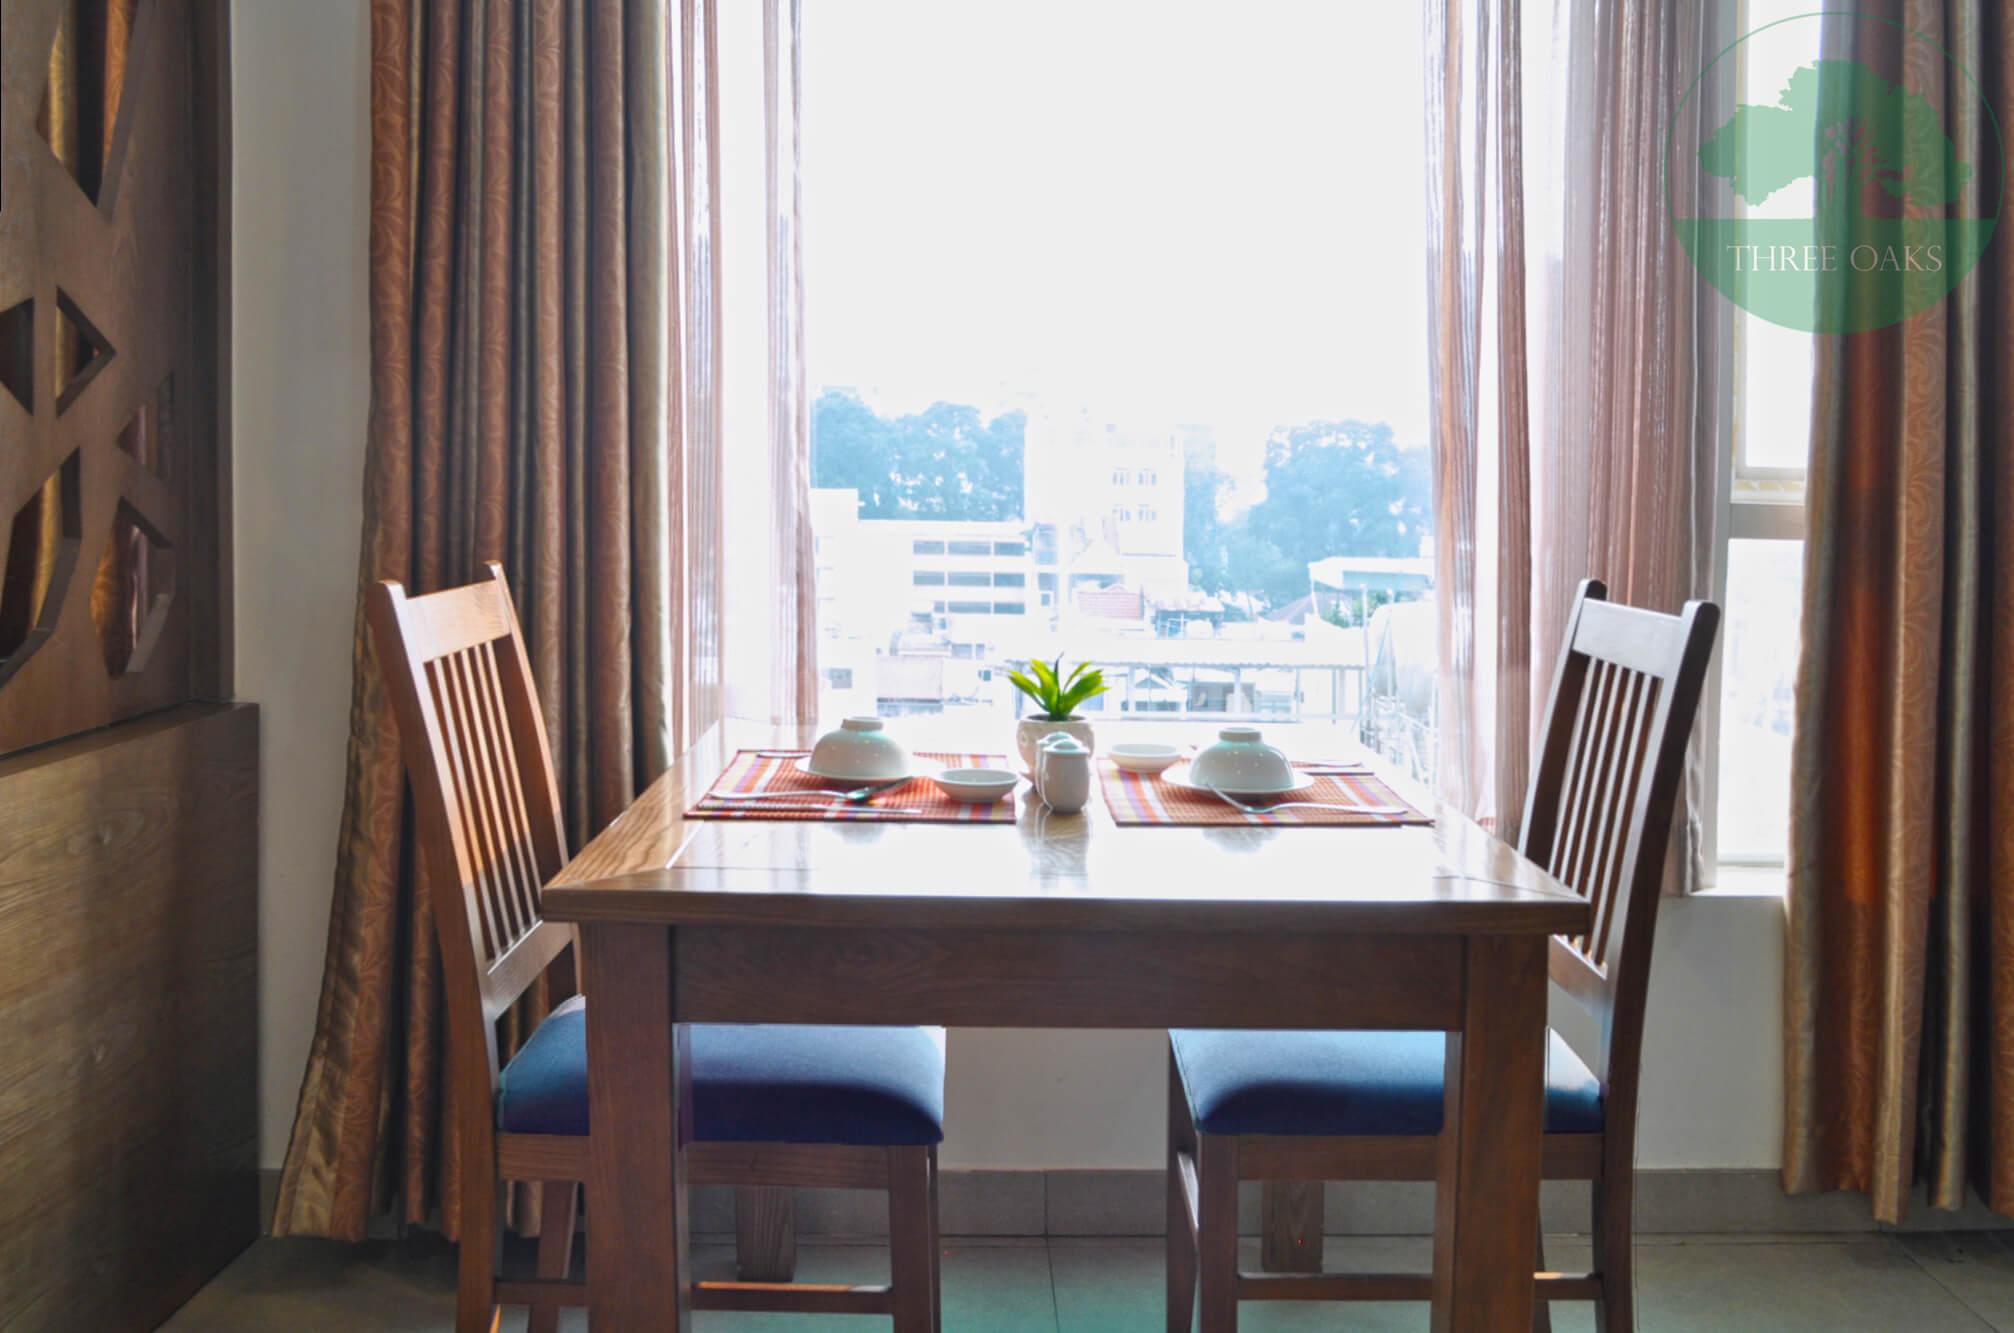 three-oaks-1-serviced-apartment-STUDIO-CITY-VIEW-Floor-5